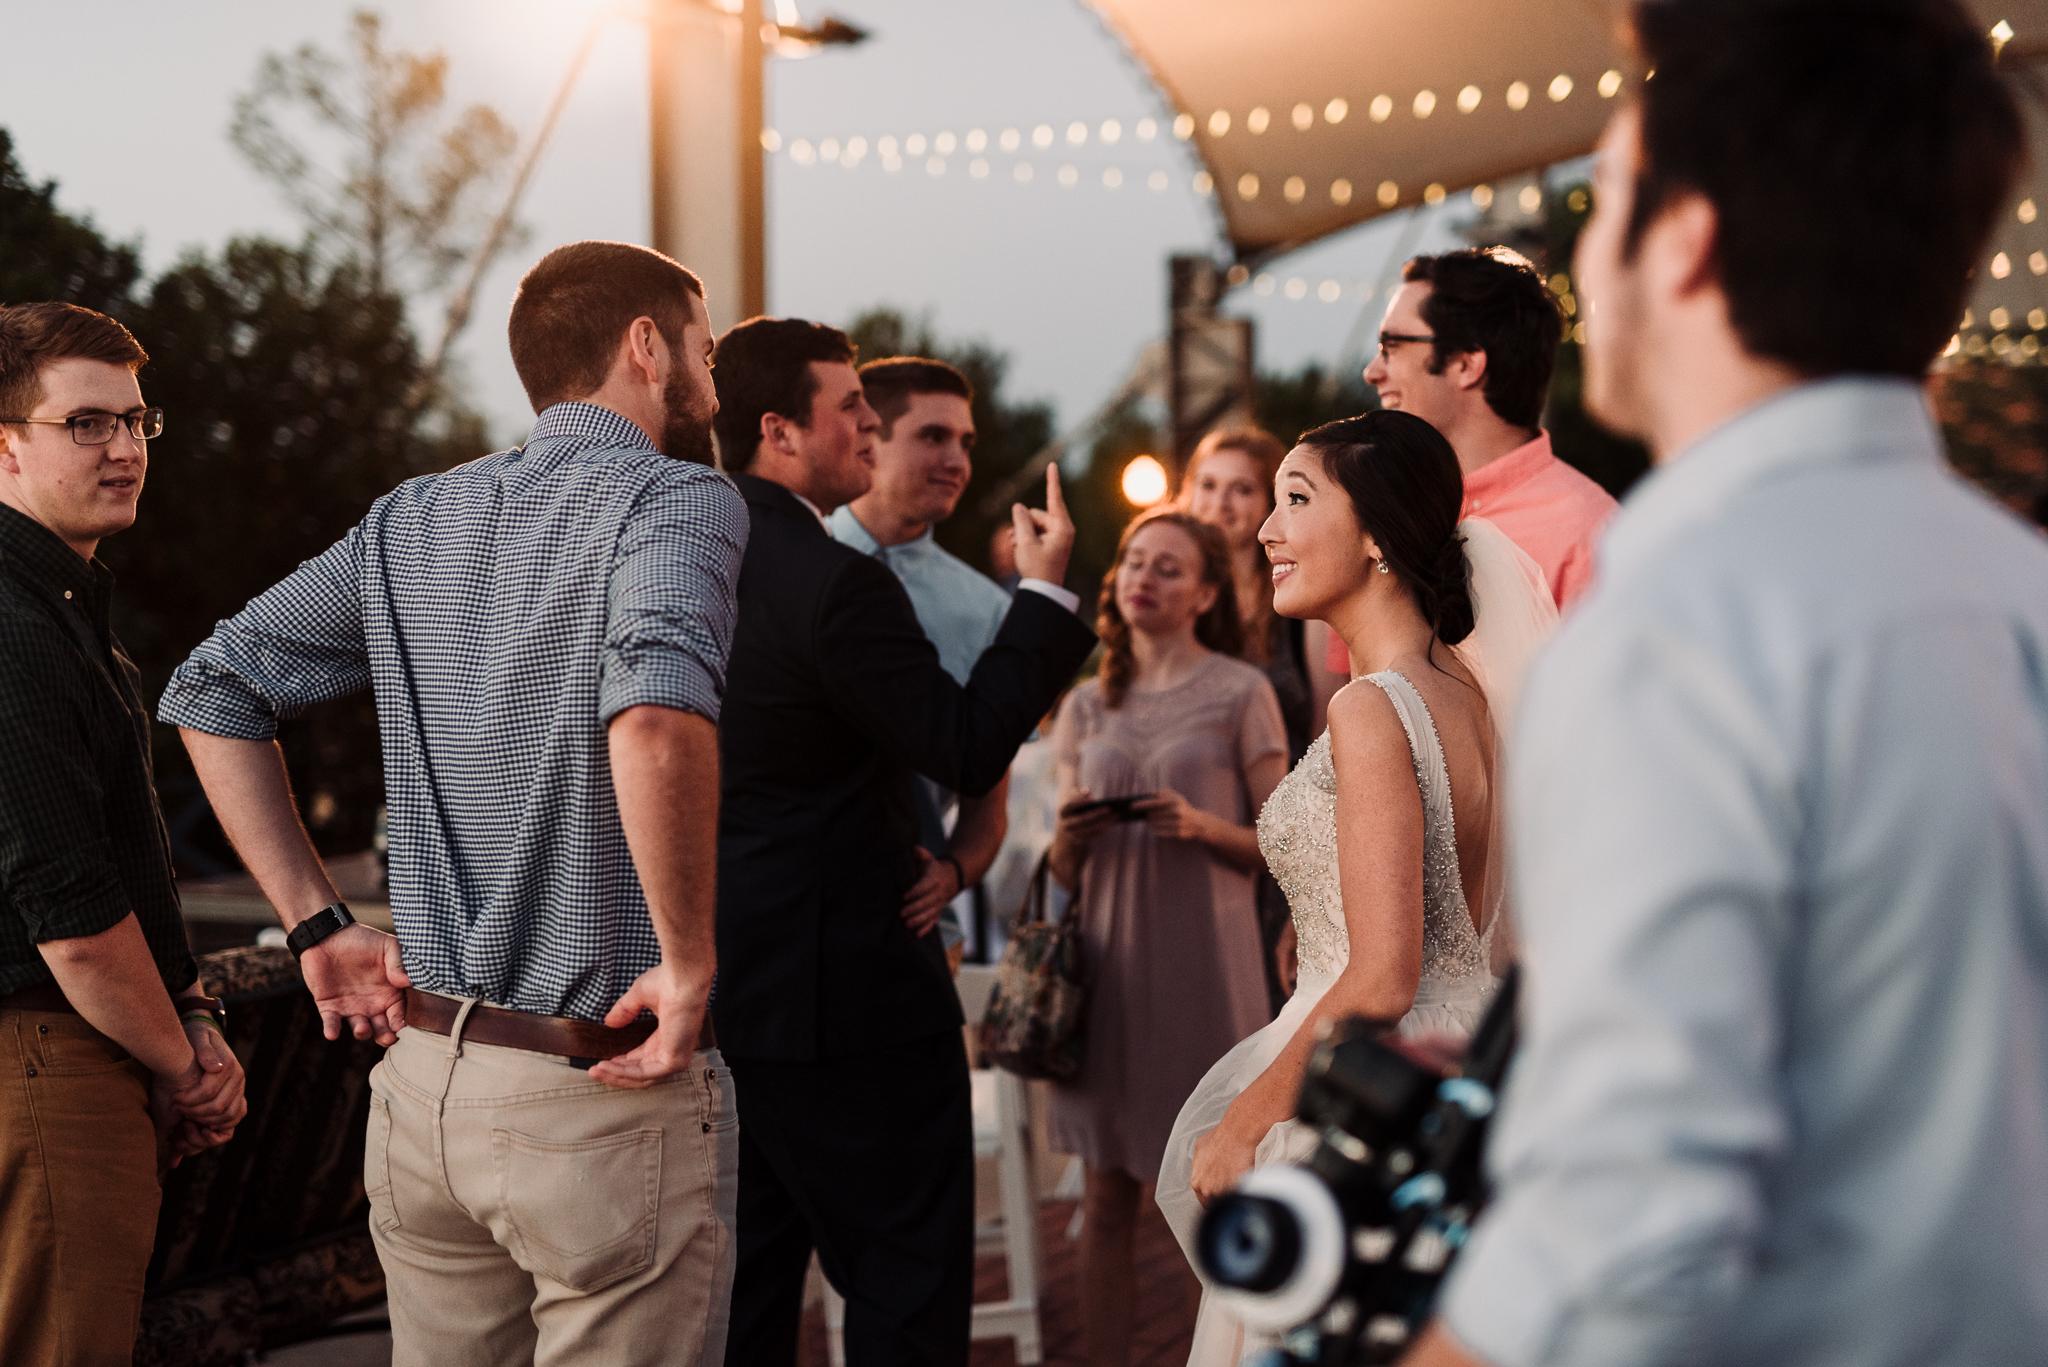 Oklahoma-Christian-University-Wedding-9358.jpg